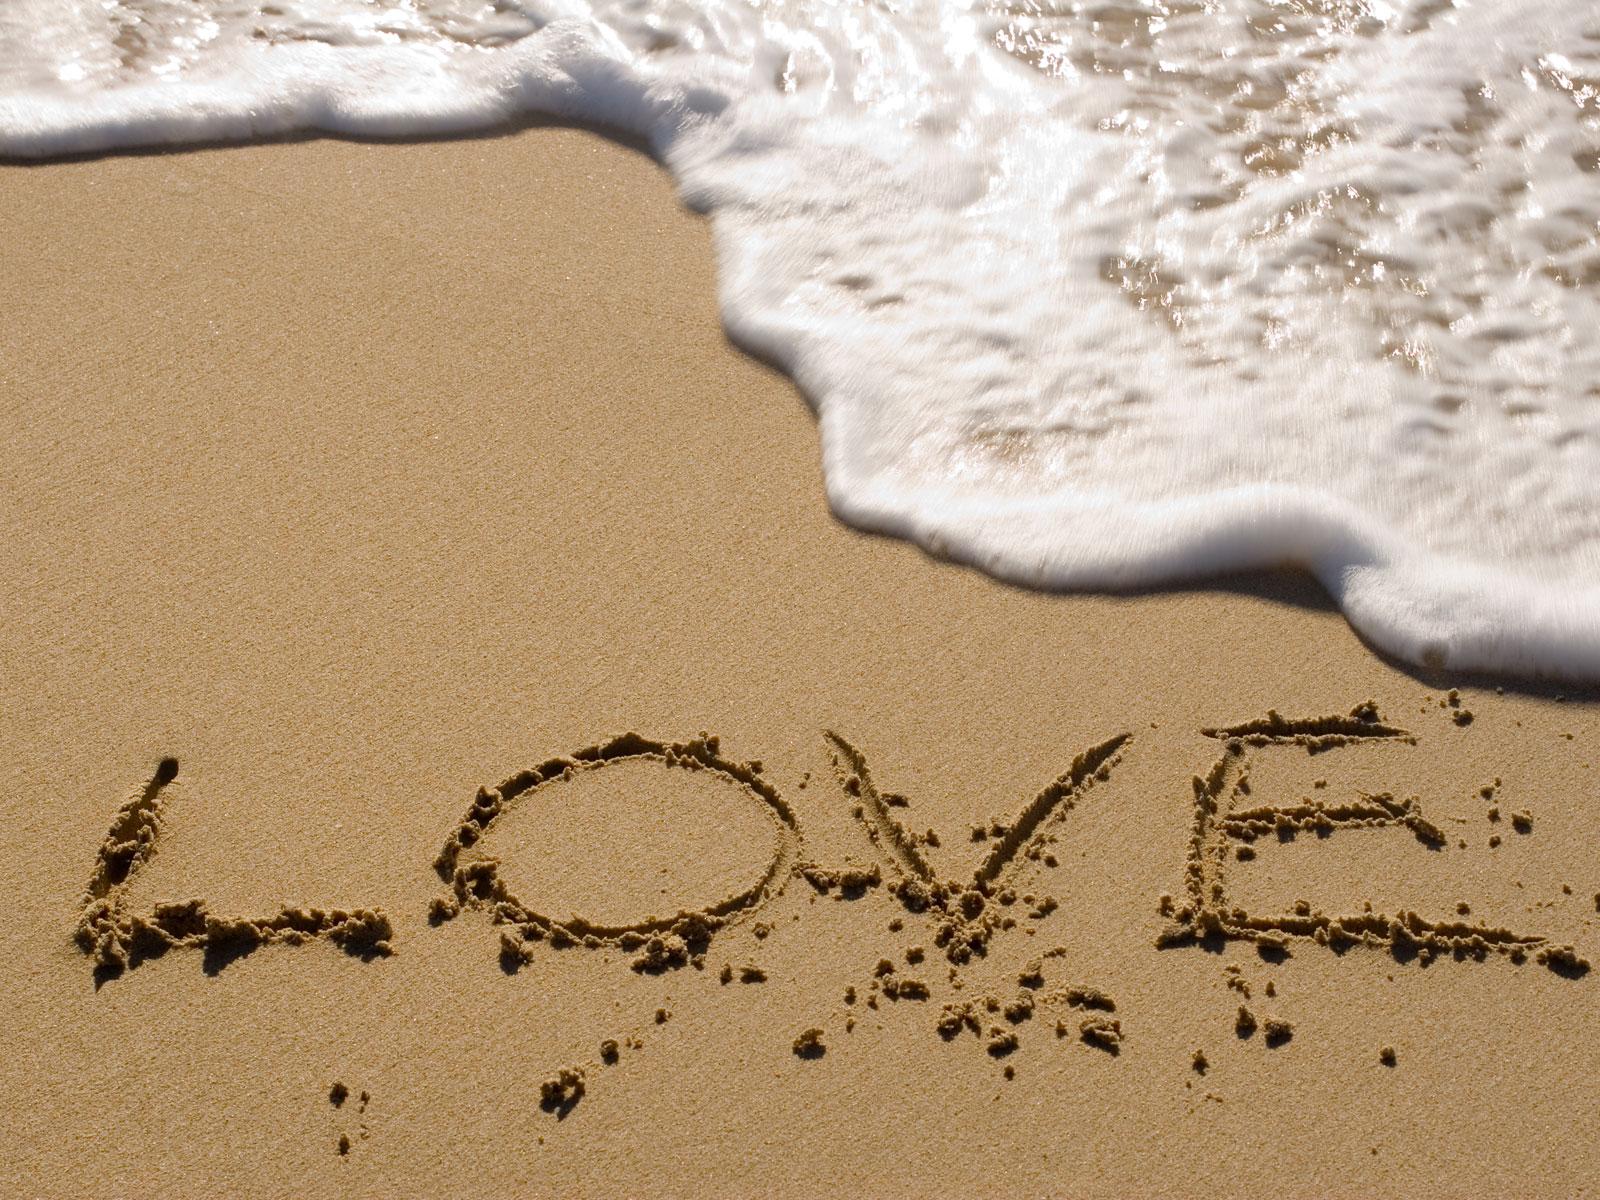 http://3.bp.blogspot.com/-5YP72mNu5_o/Tc1yx3Cs8TI/AAAAAAAAAAQ/4HlfeMxJ6NU/s1600/love_water_beach_bg-13709.jpg